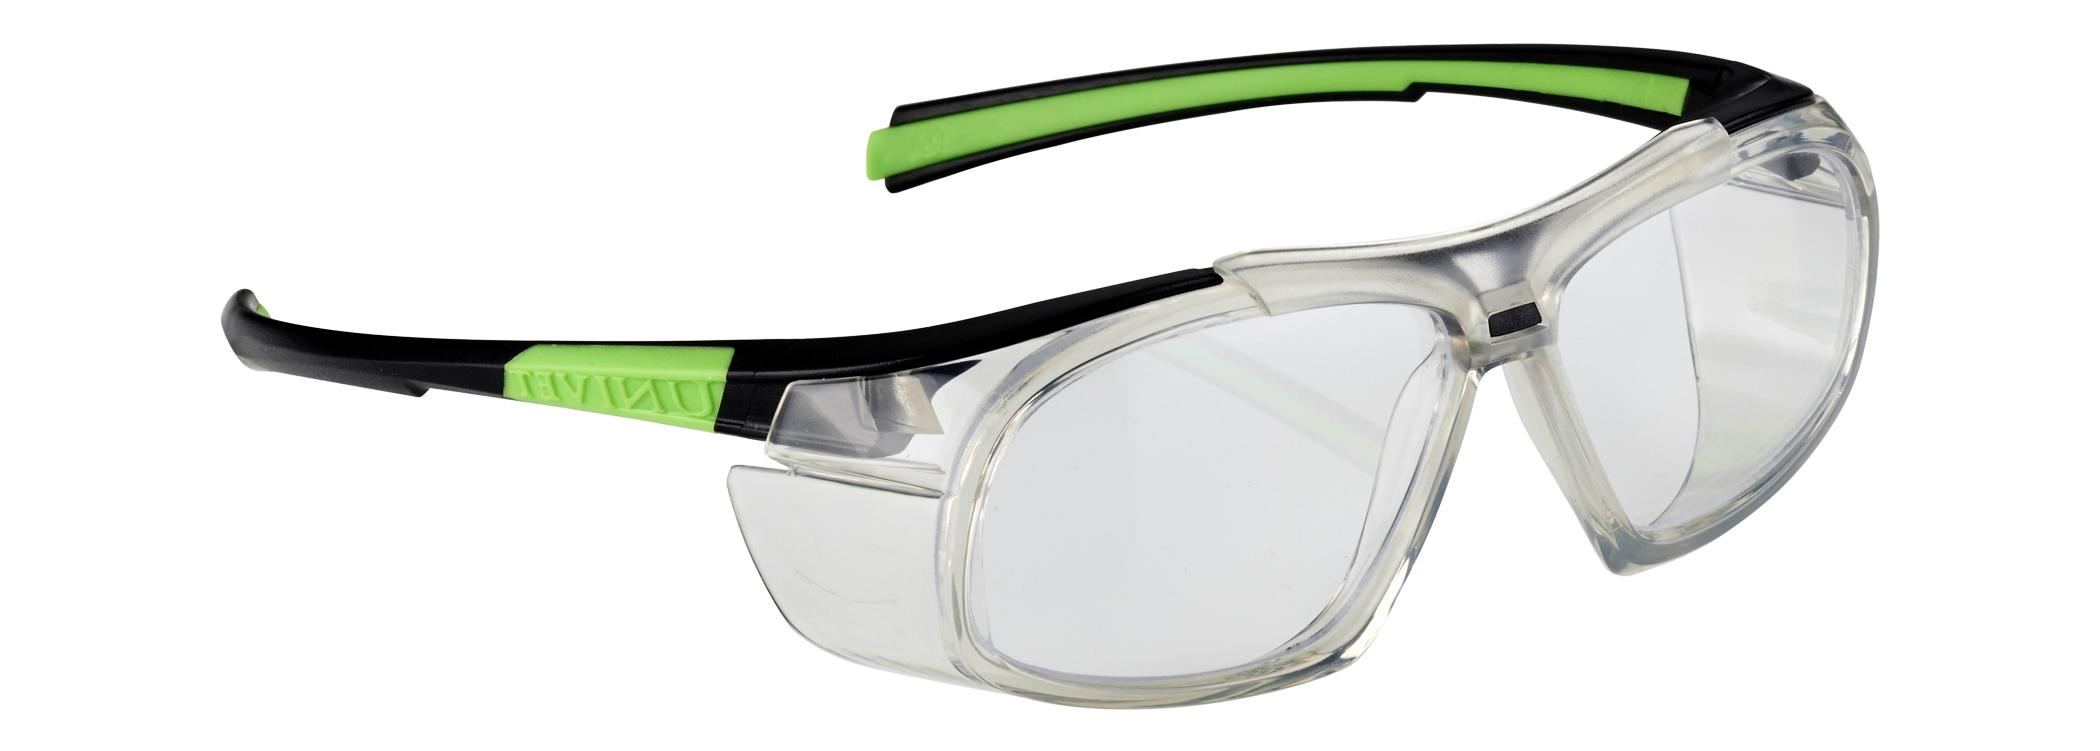 jual prescription safety glasses jakarta selatan